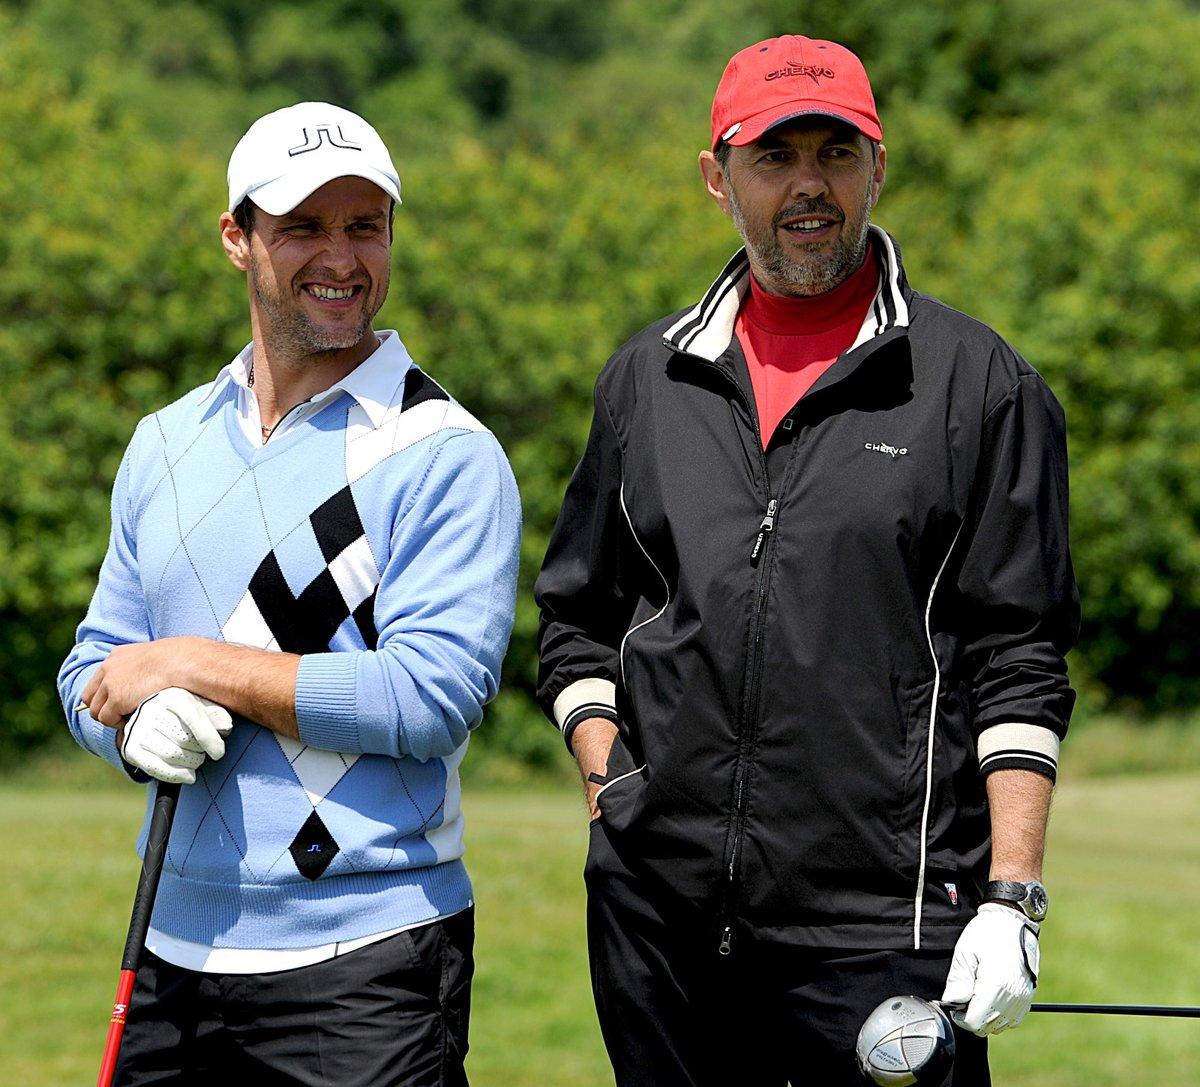 Martin Straka a Marek Eben na golfovém turnaji hokejových osobností a celebrit v roce 2009